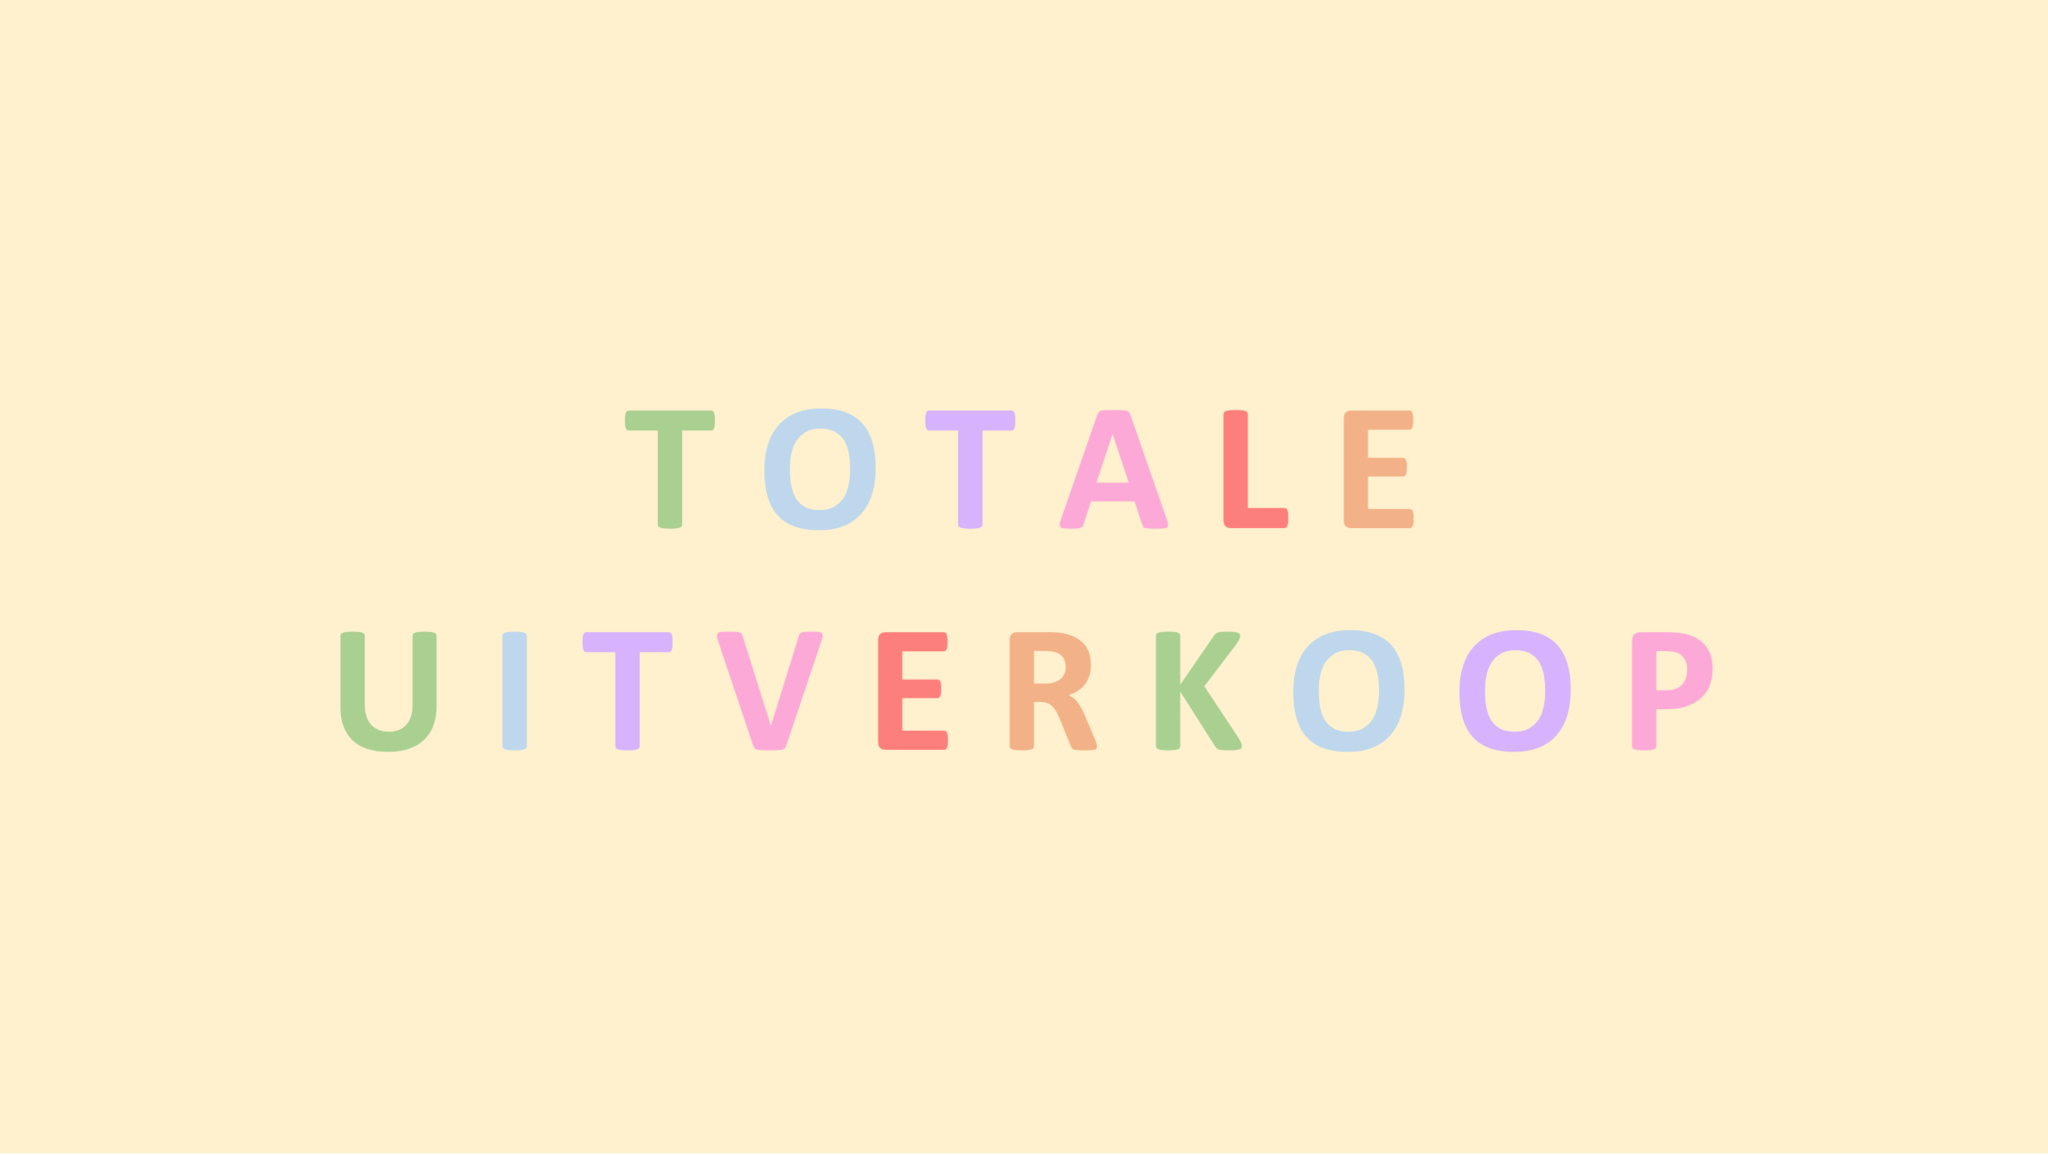 TOTALE UITVERKOOP